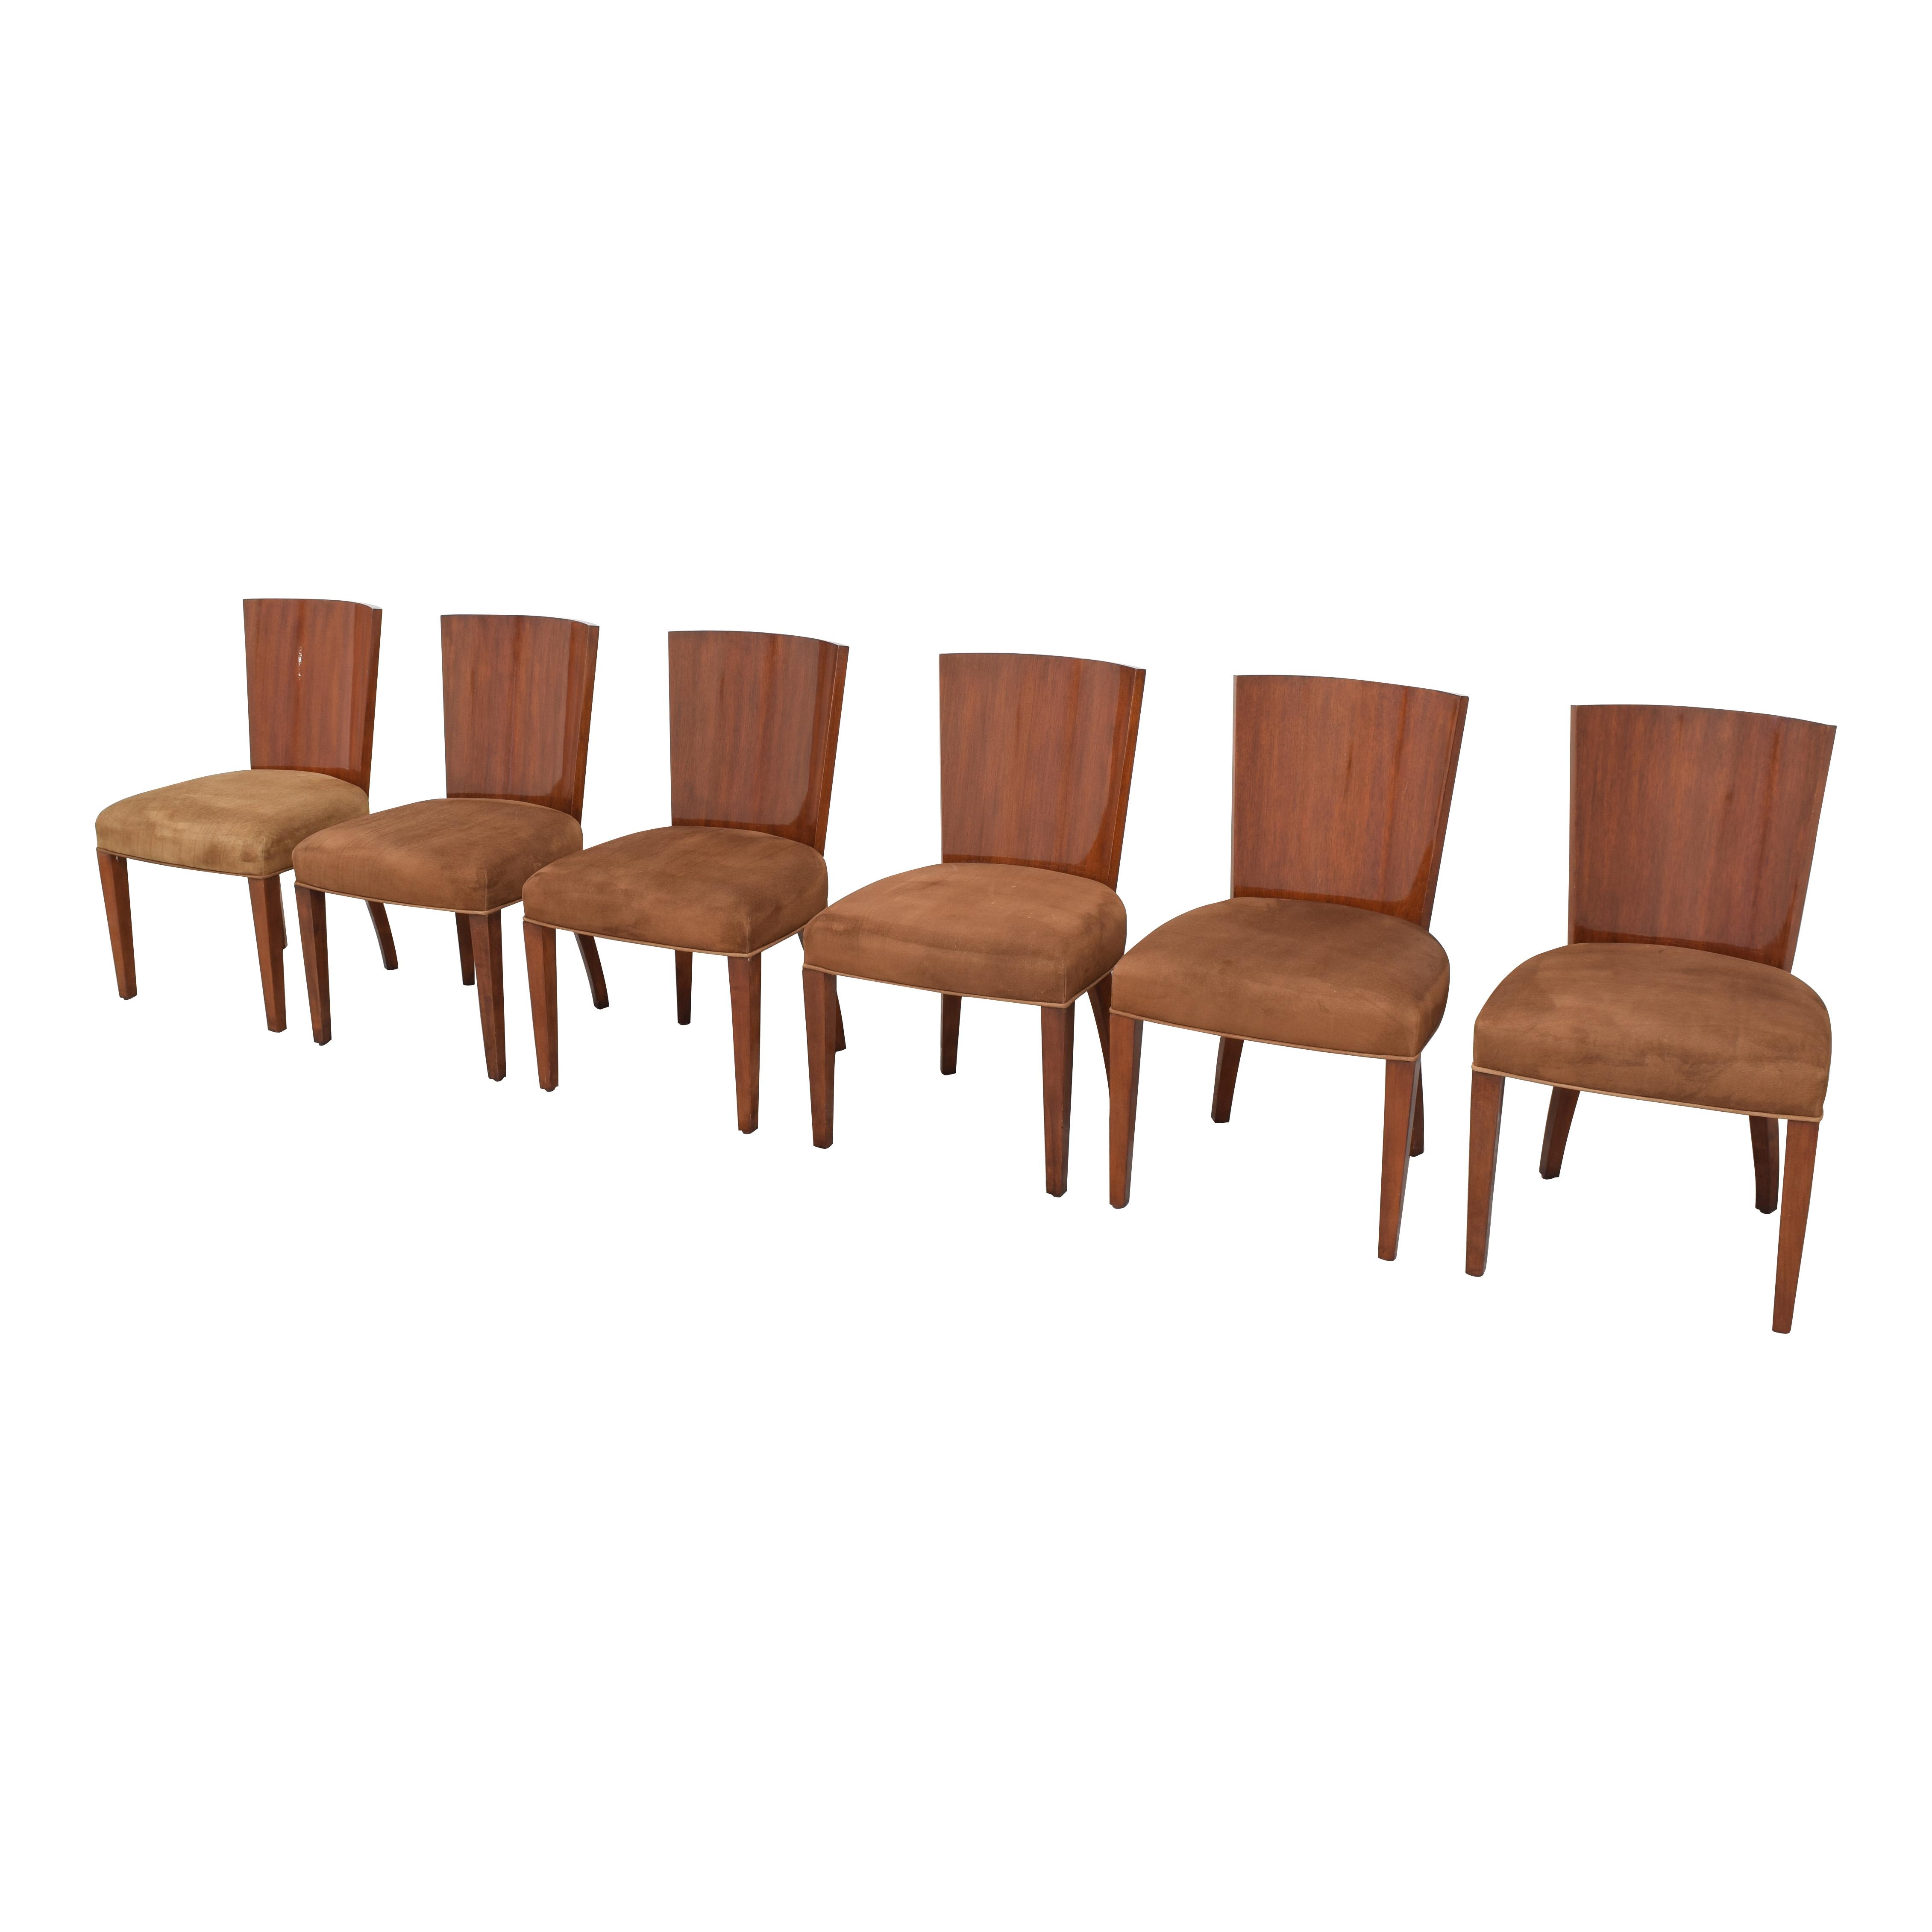 Ralph Lauren Home Ralph Lauren Modern Hollywood Dining Side Chairs dimensions